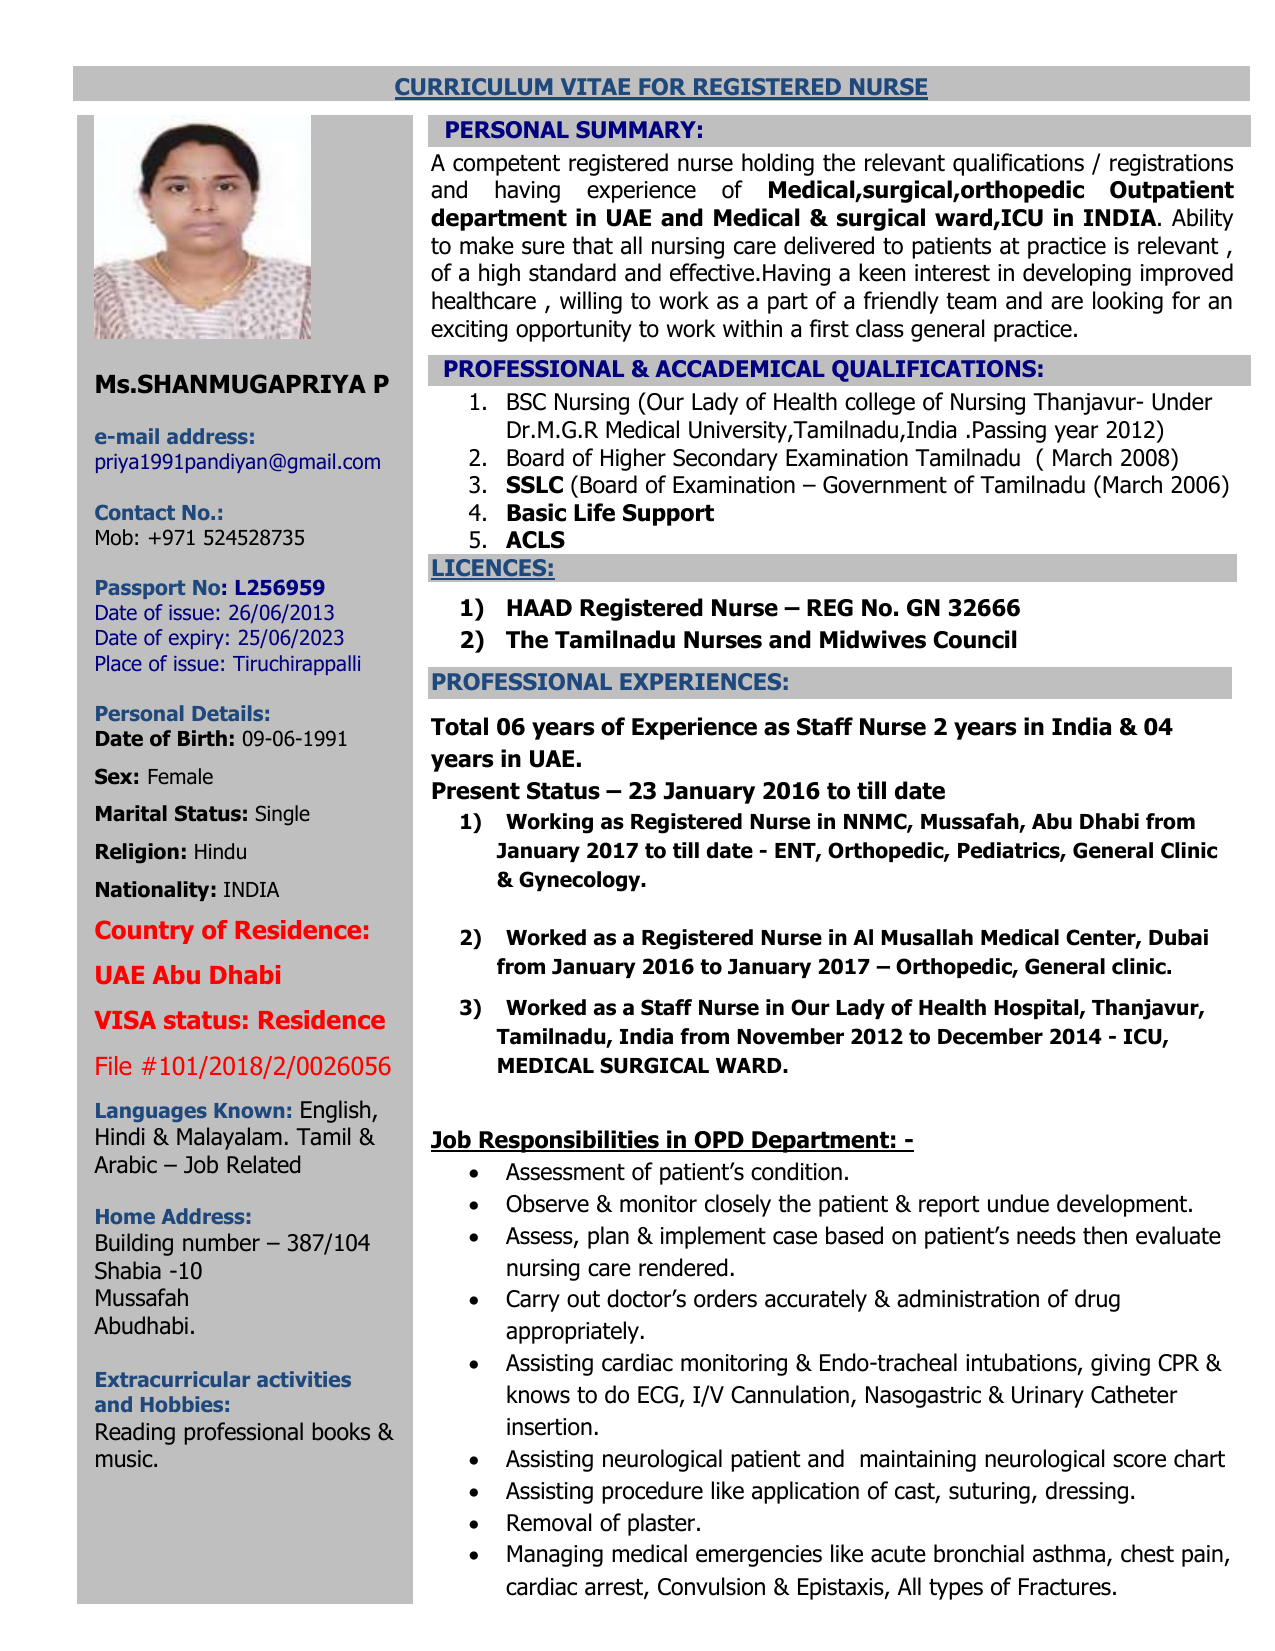 Shanmugapriya resume compare and contast essays